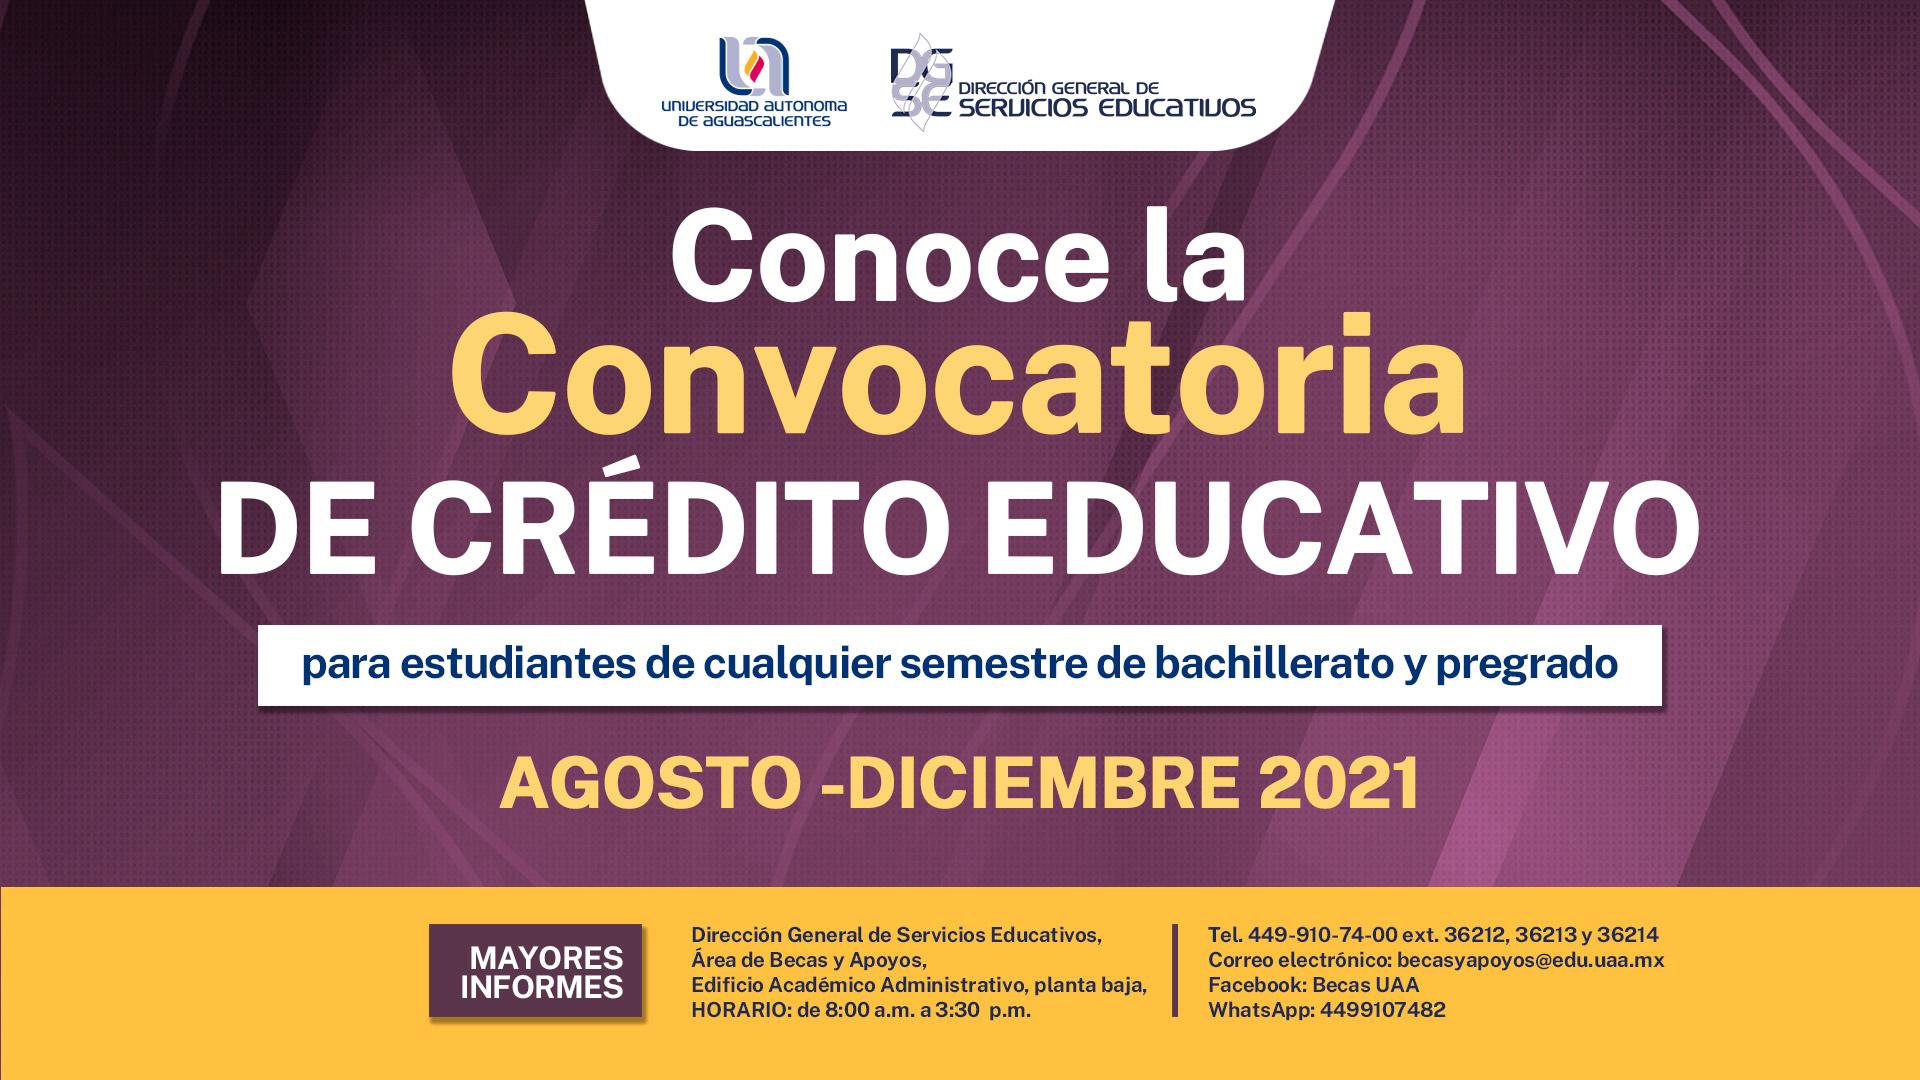 Convocatoria de Crédito Educativo